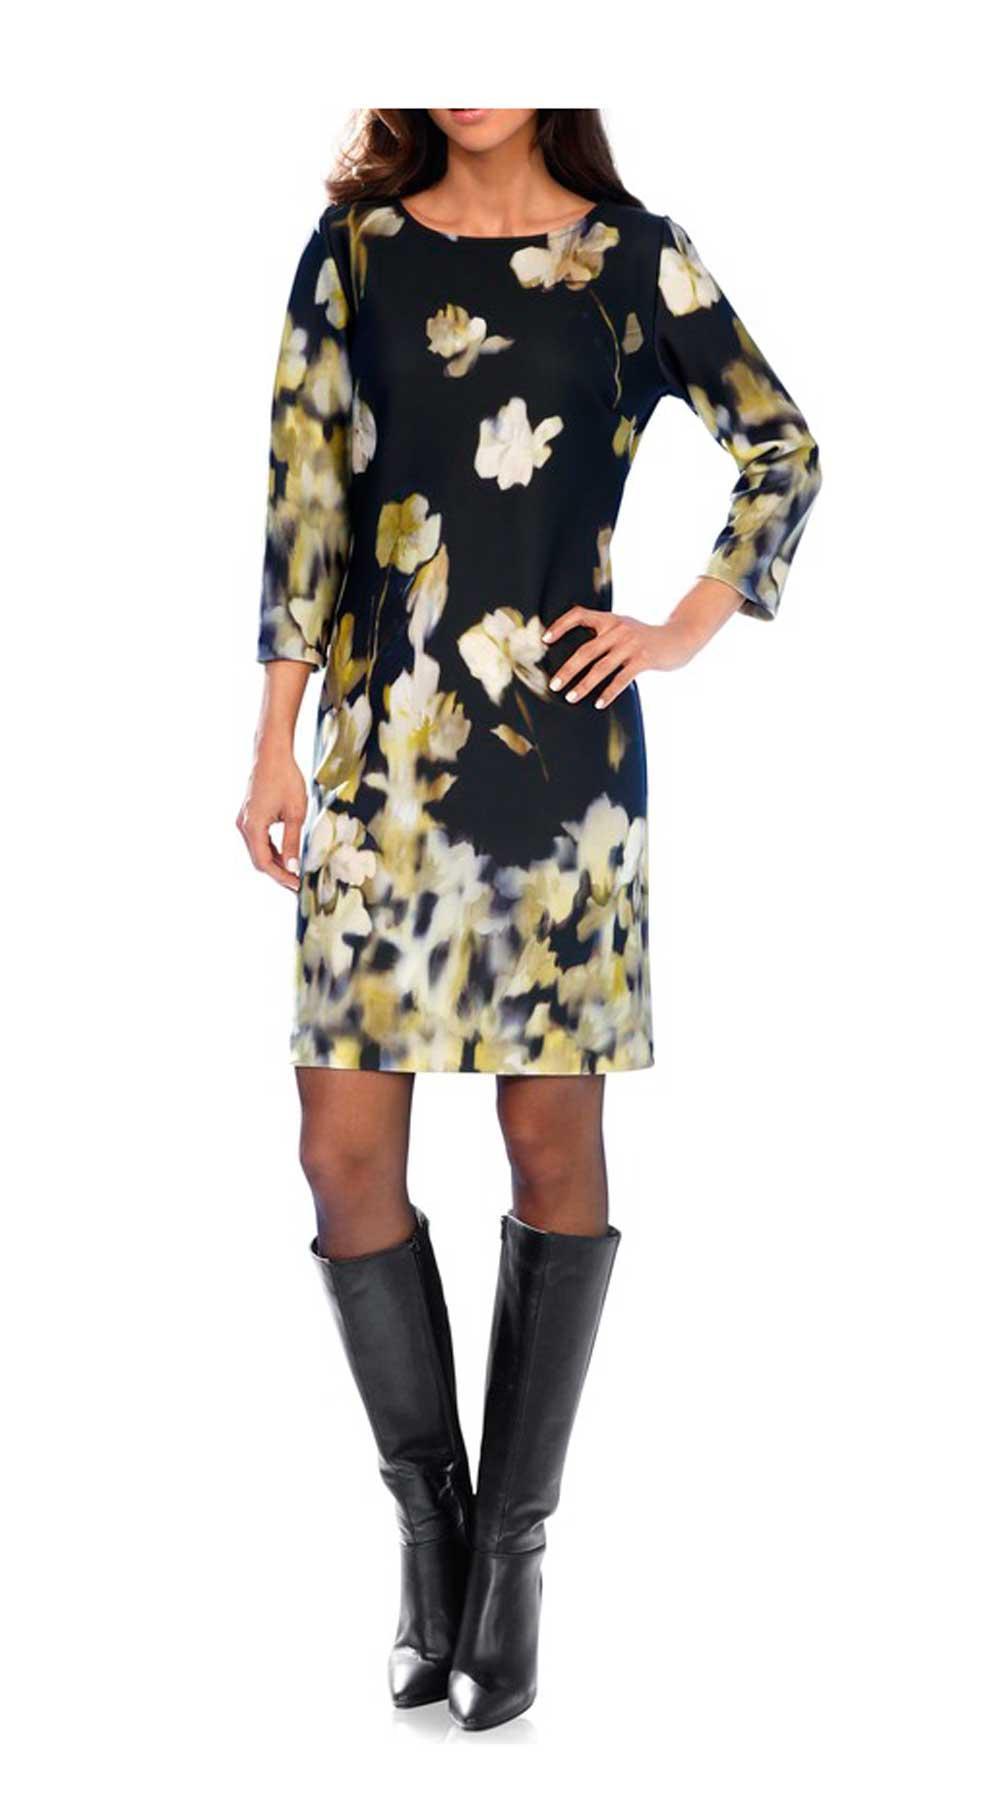 Designer-Kleid schwarz-gelb | Kleider | Outlet Mode-Shop